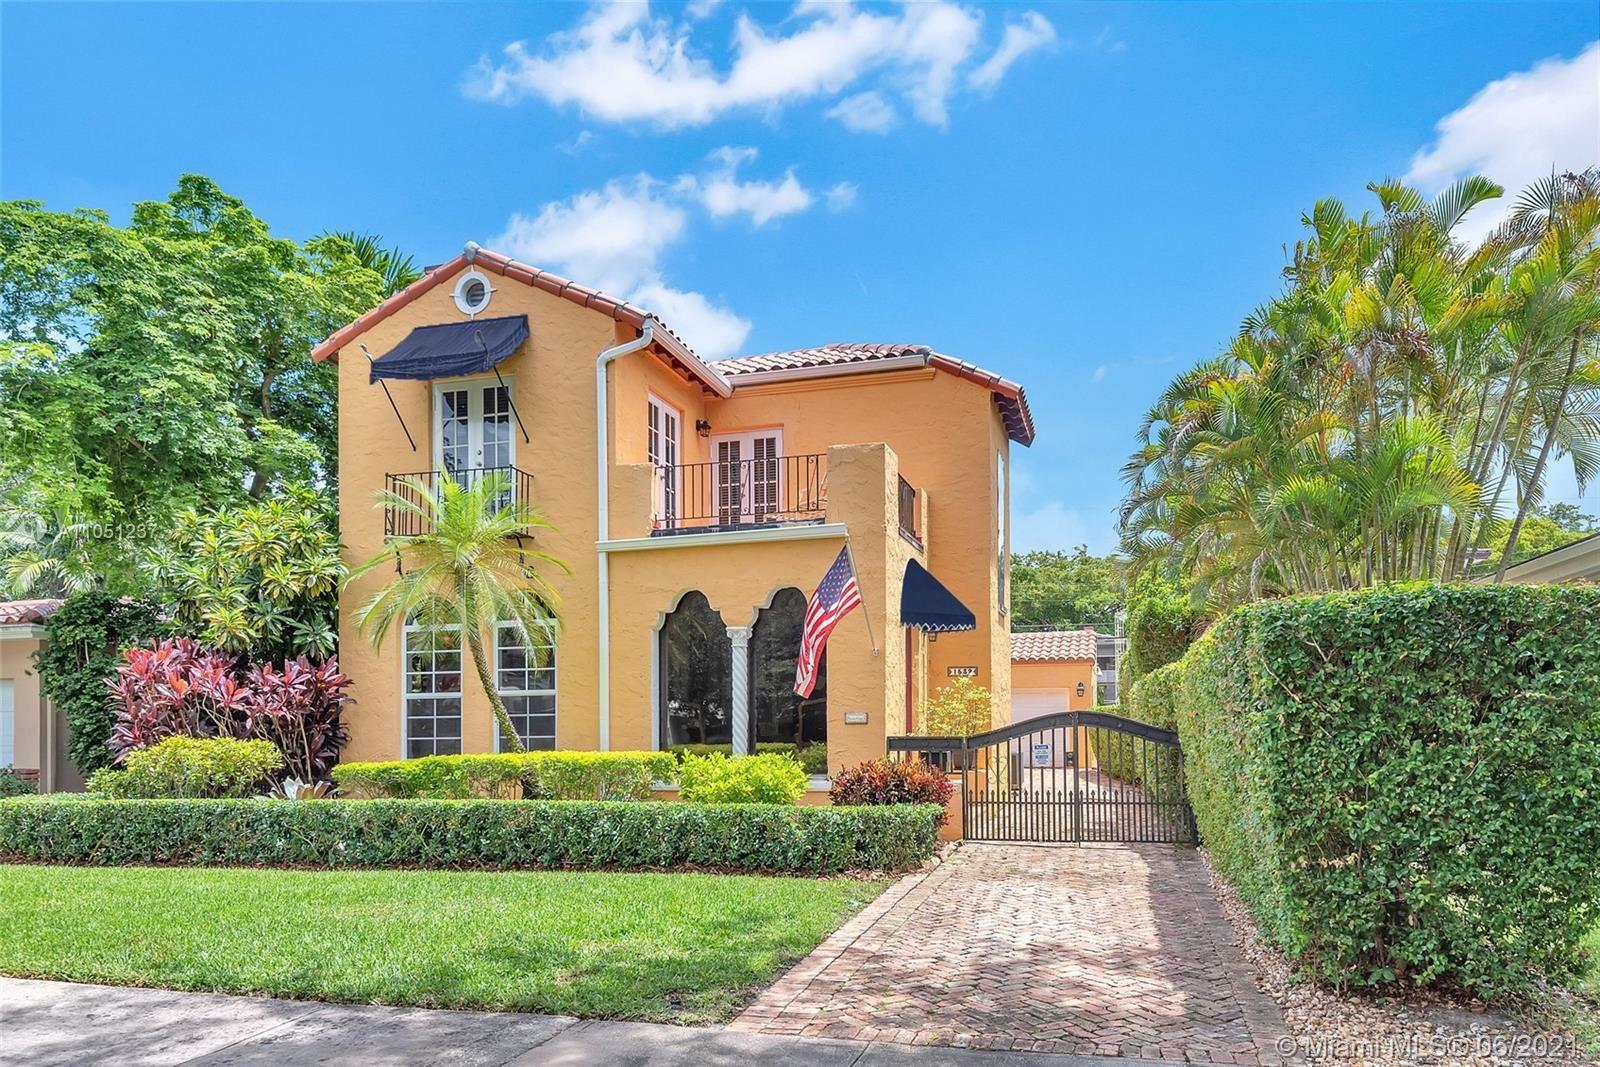 1532 Catalonia Ave, Coral Gables, FL 33134 - #: A11051237